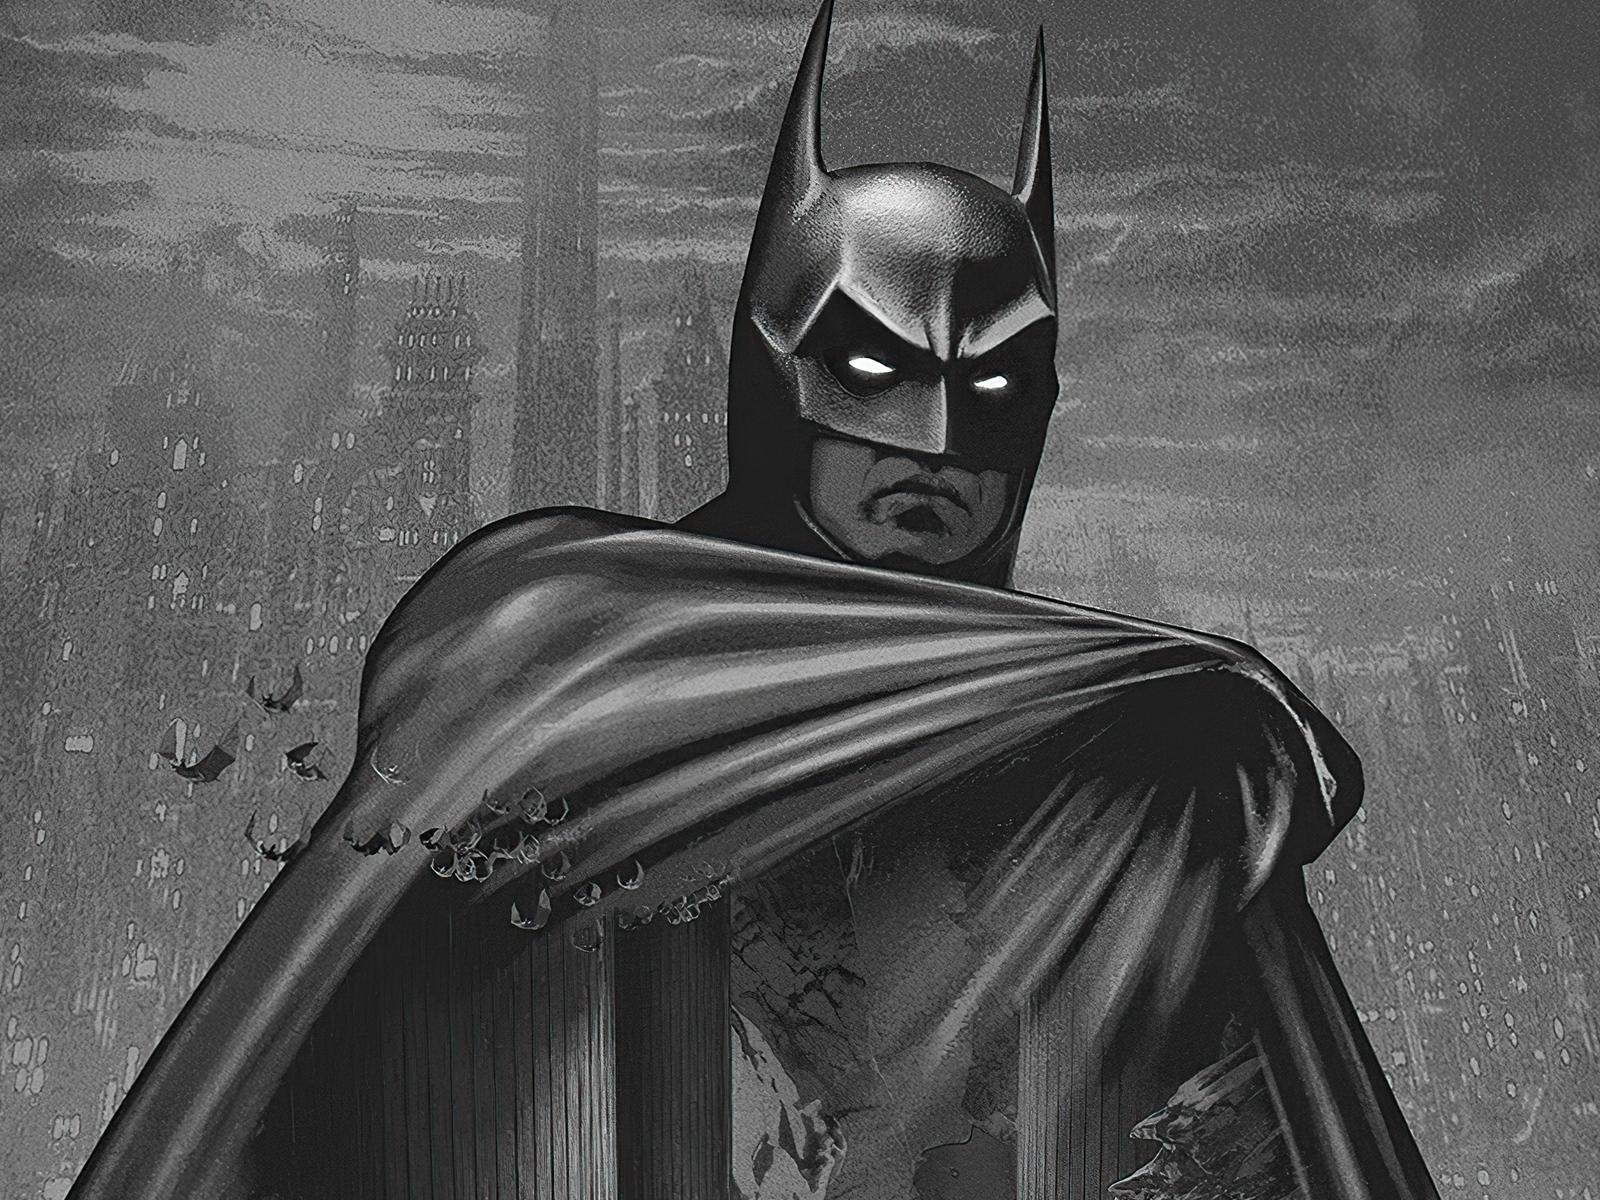 batman-life-monochrome-4k-m7.jpg